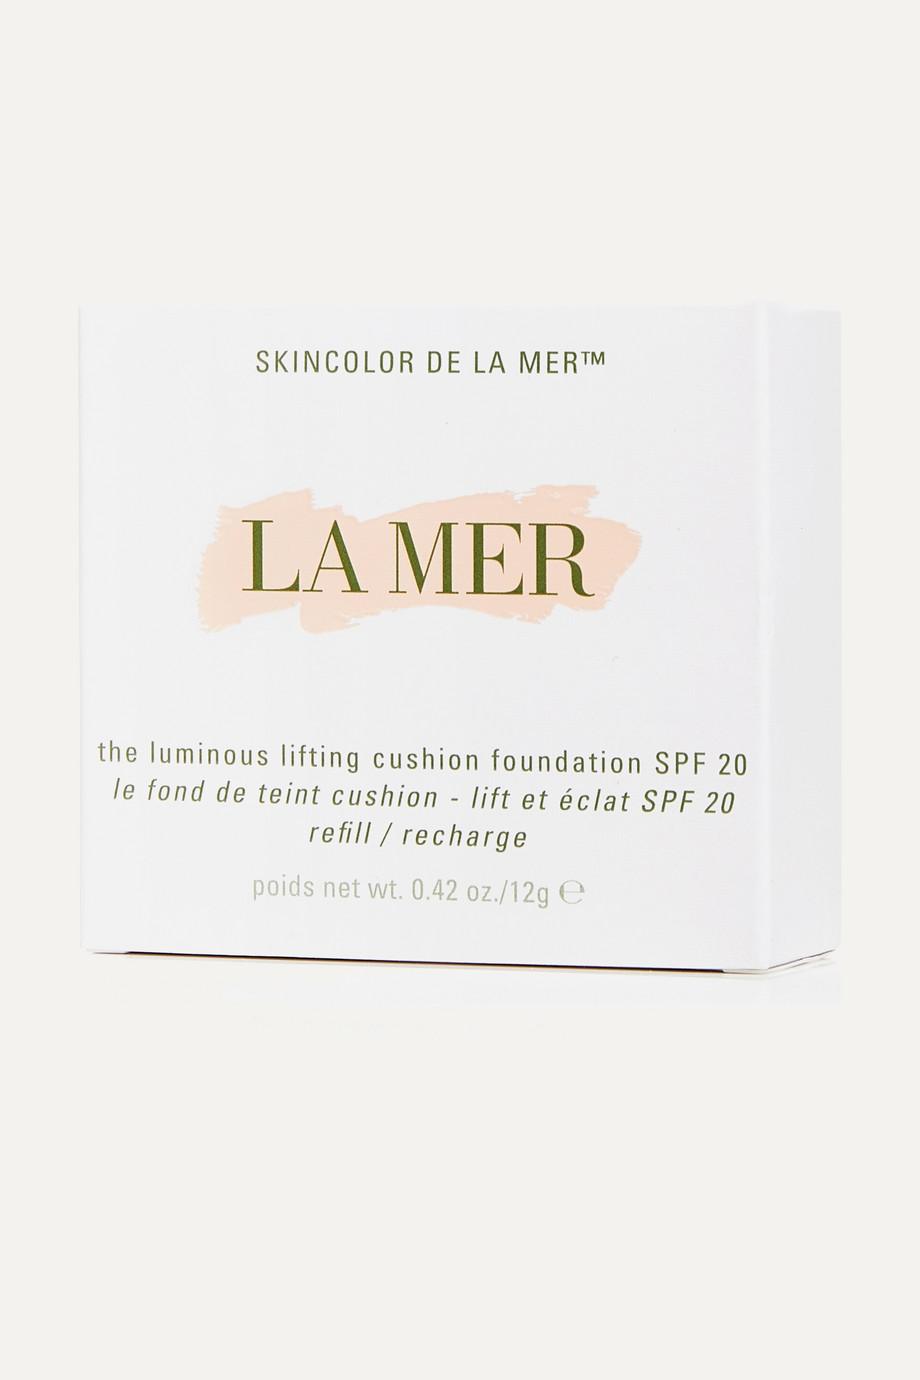 La Mer The Luminous Lifting Cushion Compact Foundation SPF20 Refill - 41 Soft Cameo